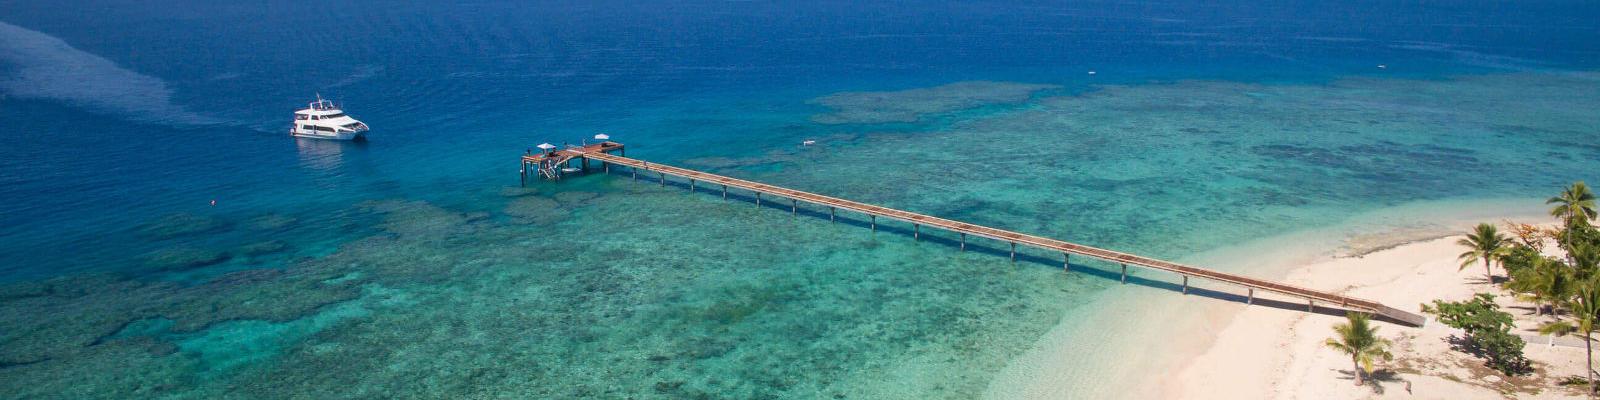 aerial view of malamala resort fiji